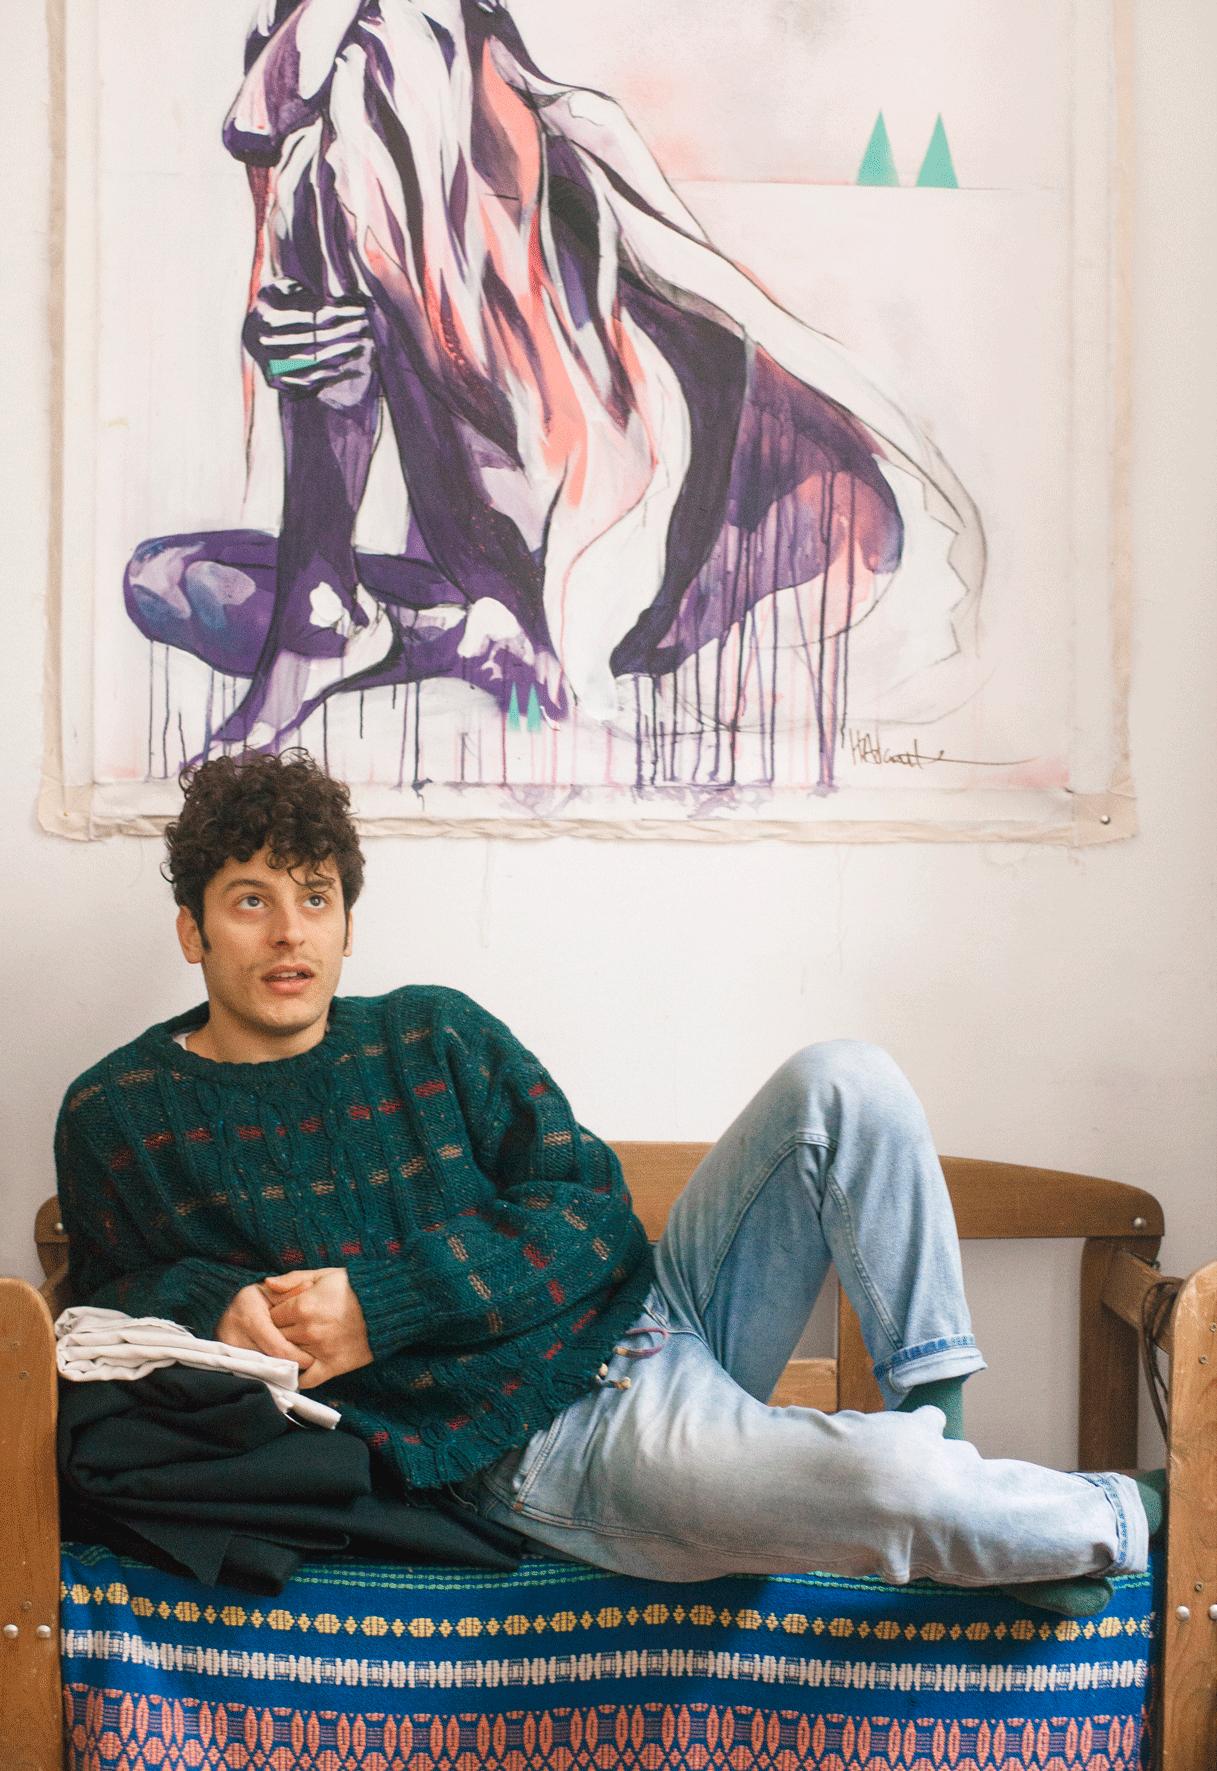 Matteo-Pavesi-Pavlov-Guys-On-Clothes-Oe-magazine-III